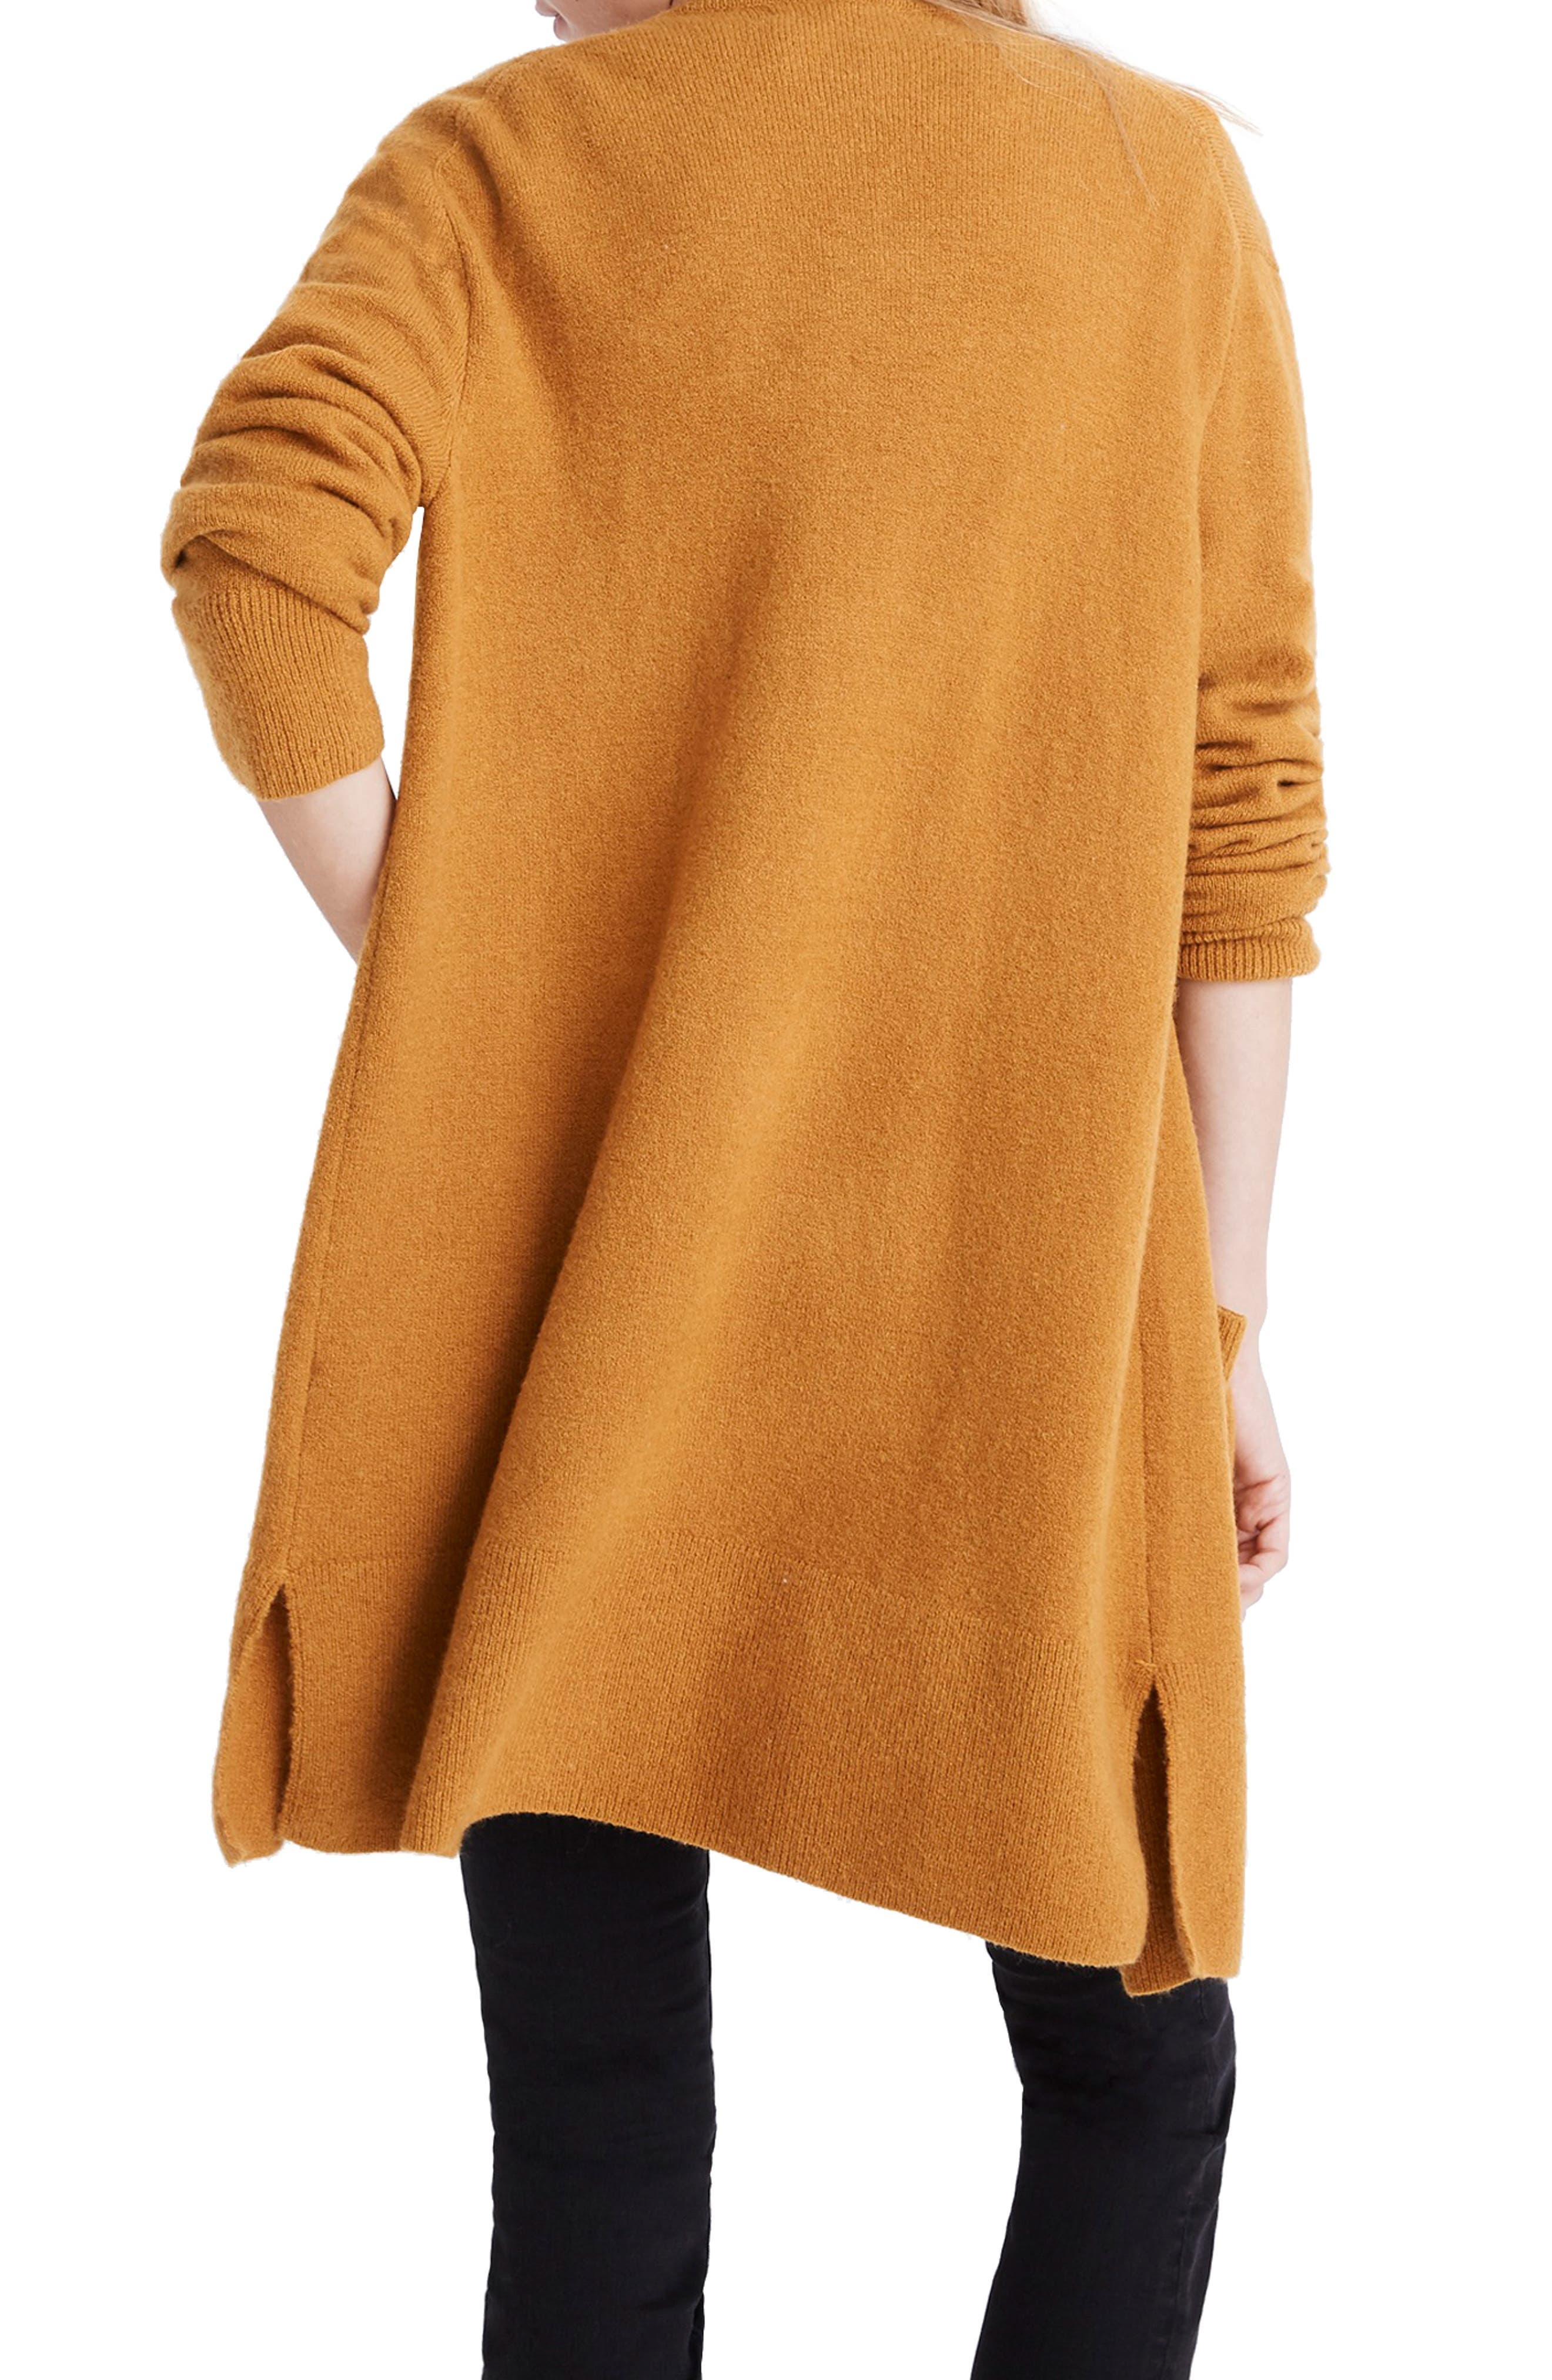 MADEWELL, Kent Cardigan Sweater, Alternate thumbnail 2, color, 801